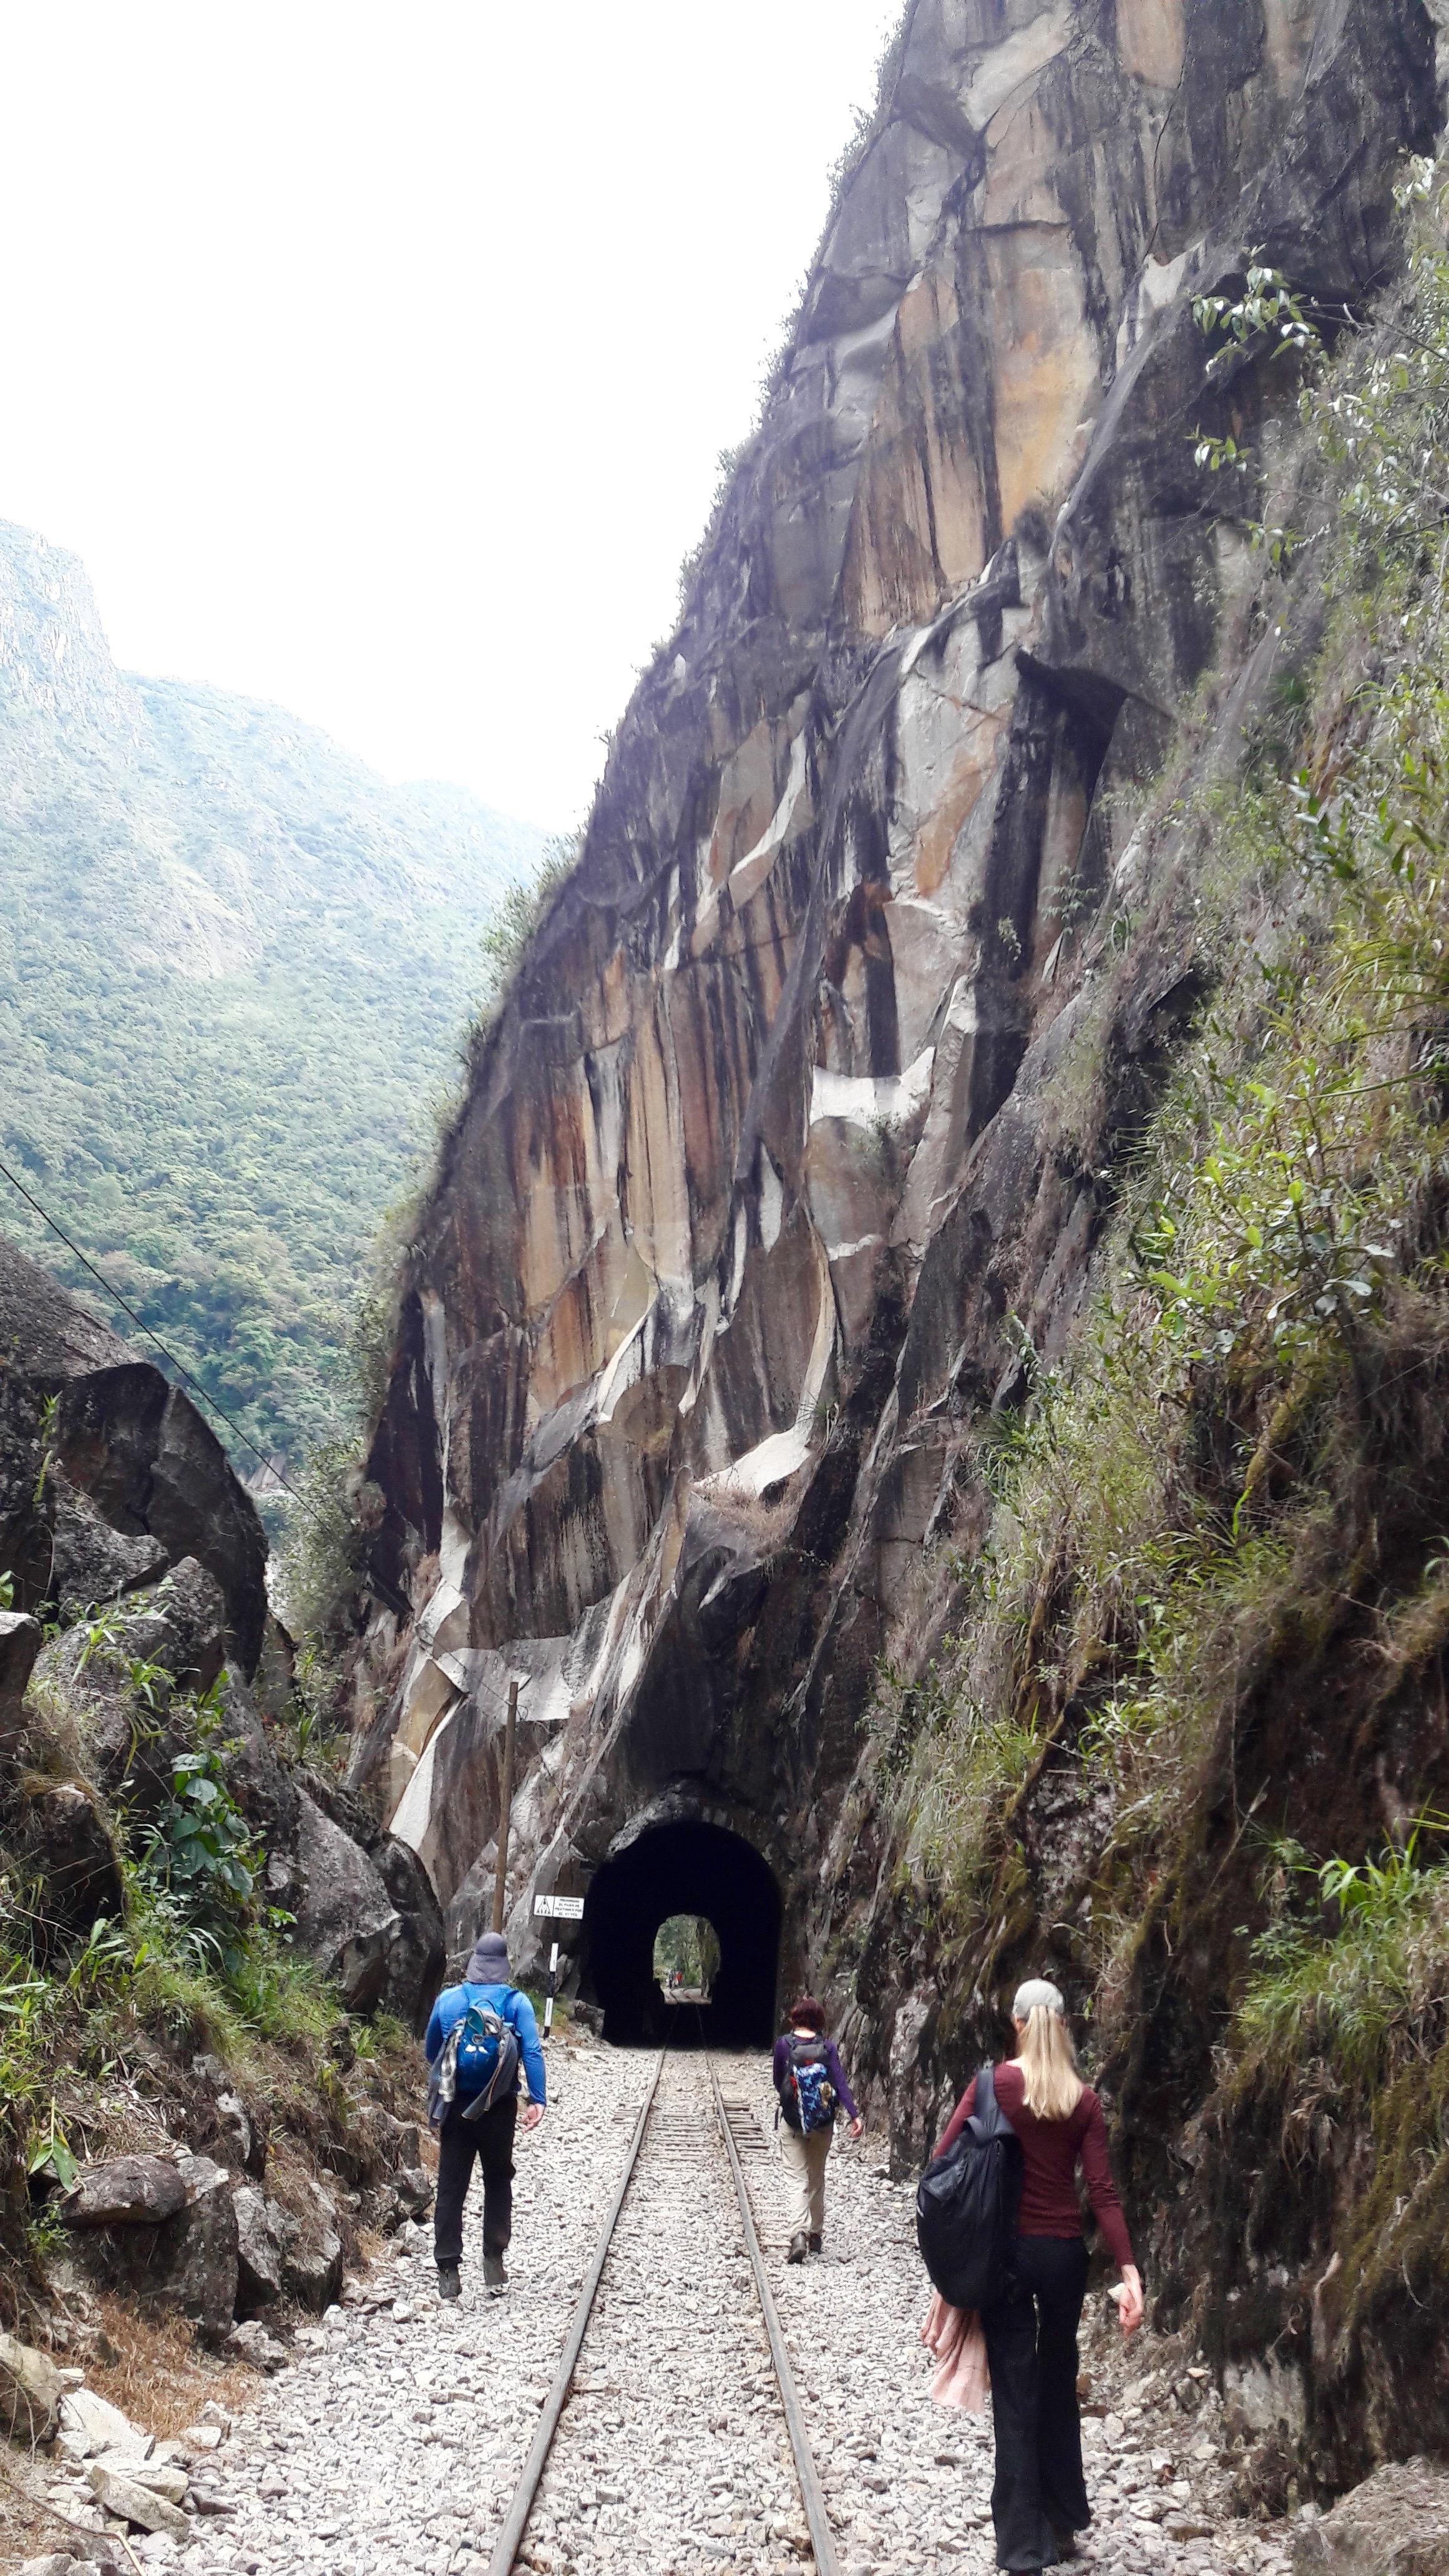 Peruu - šamanistlik väereis Amazonas